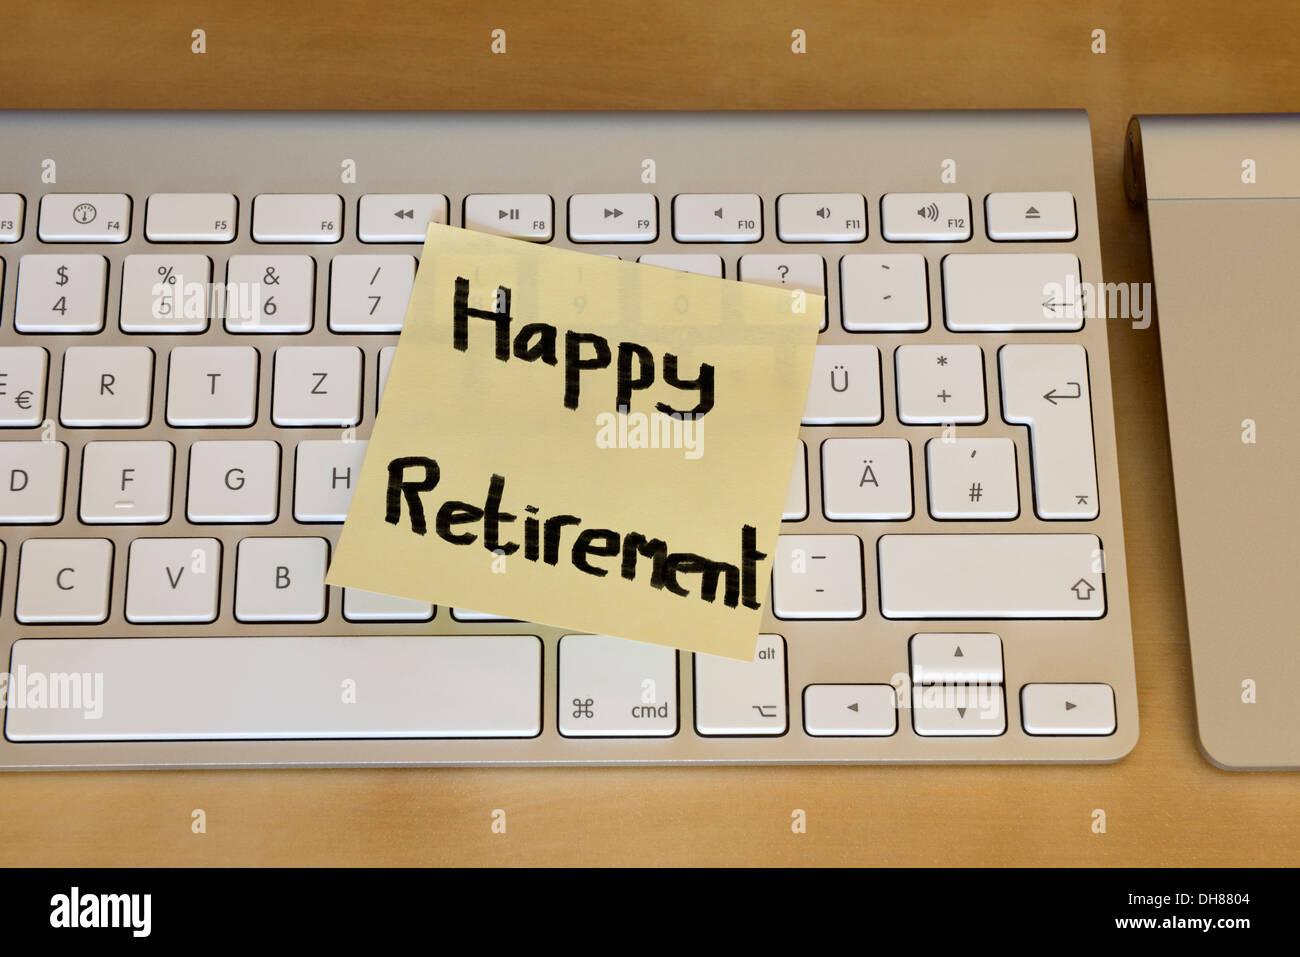 Post it note 'Happy retirement' - Stock Image